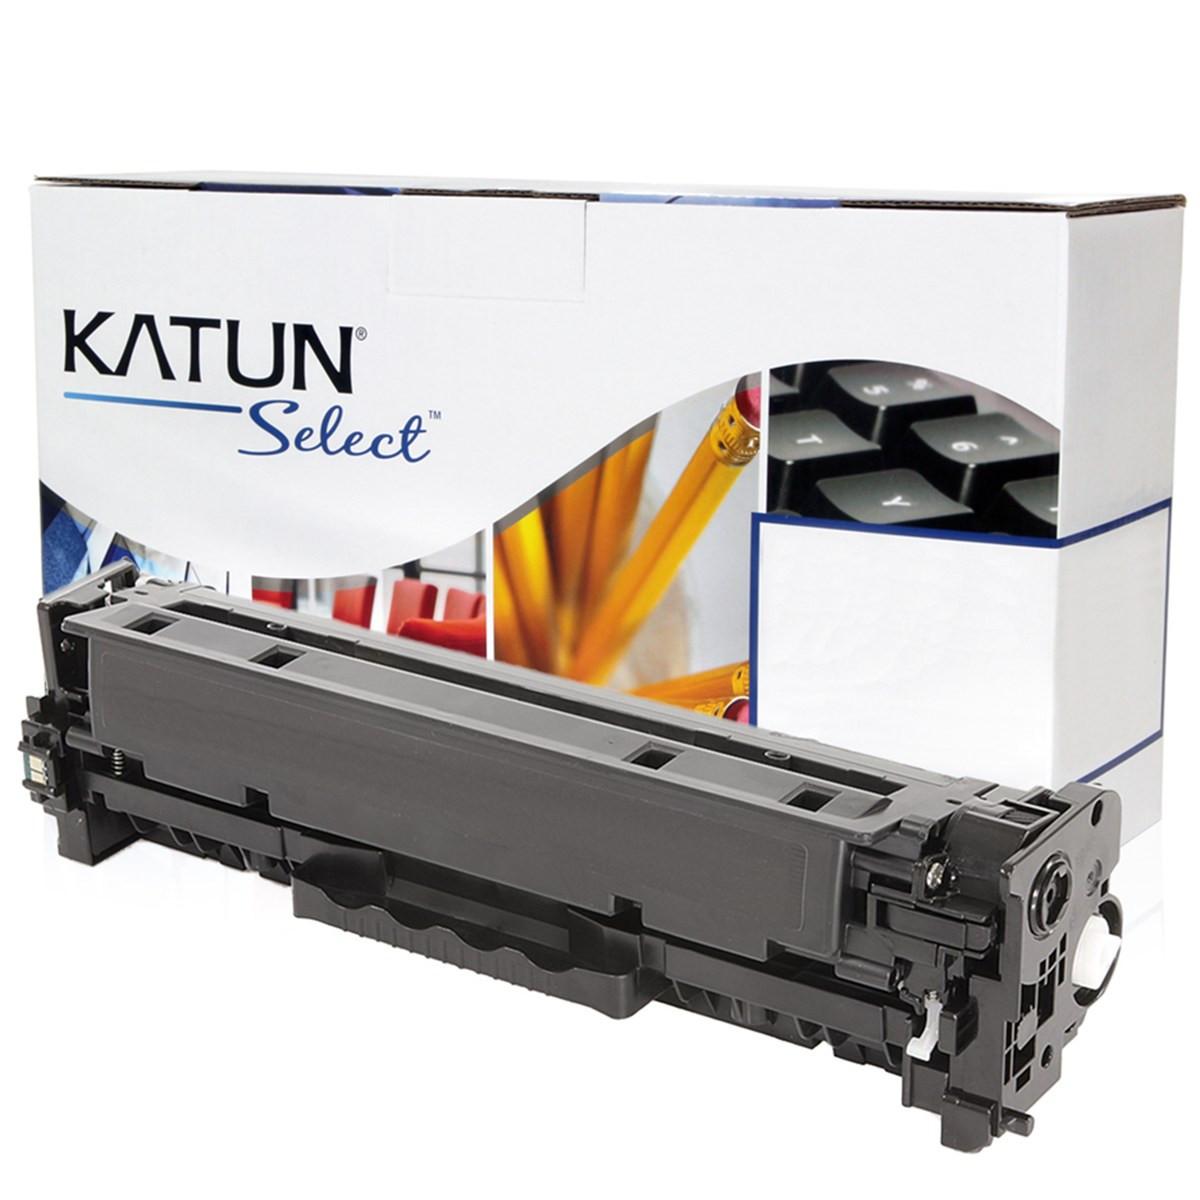 Toner Compatível com HP CF382A 82A 312A Amarelo | M476 M476DN M476DW M476NW | Katun Select 2.7k